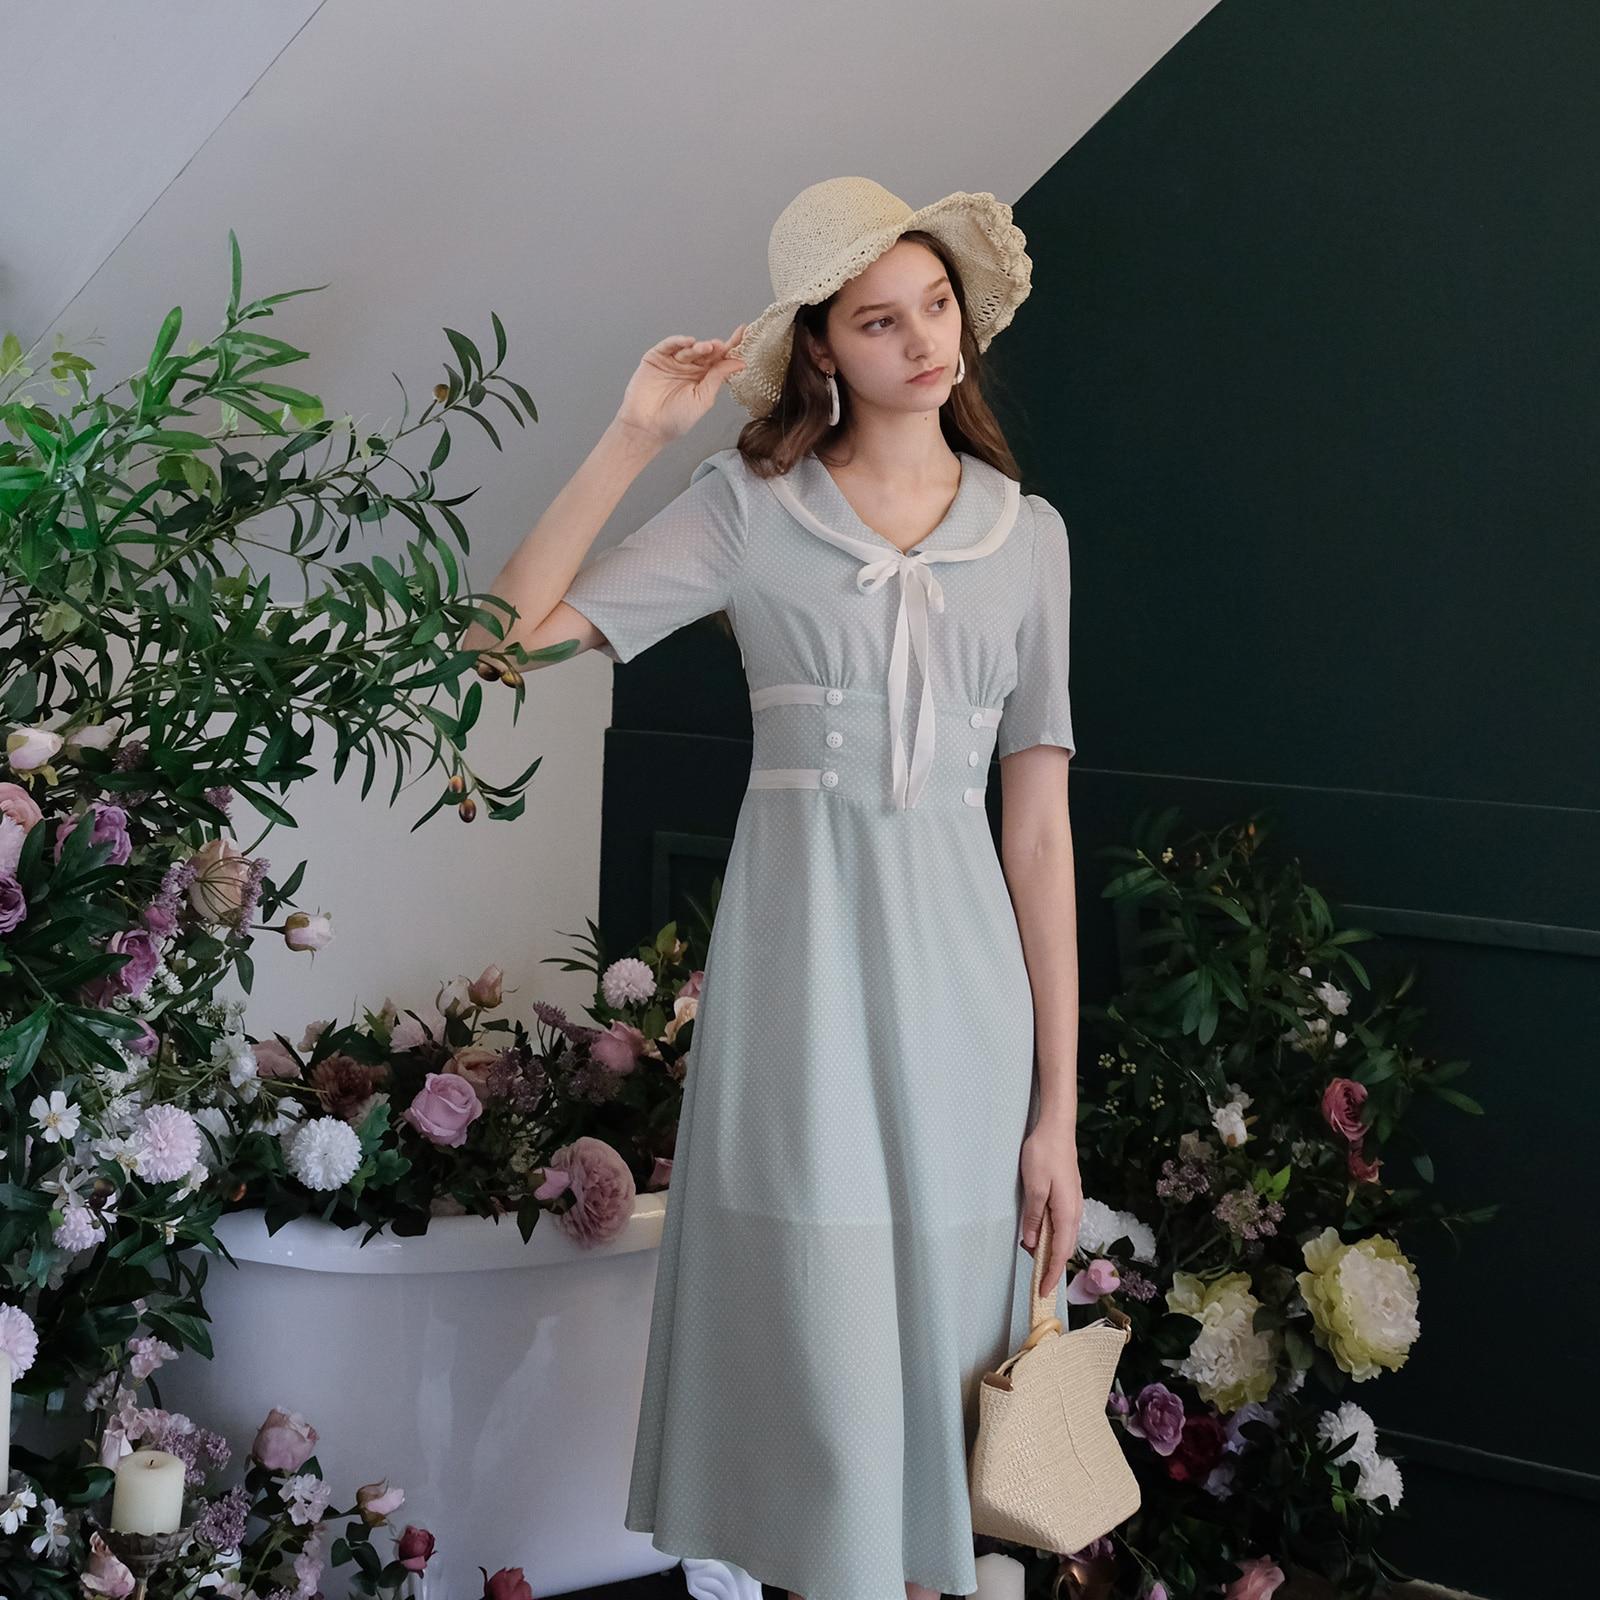 Summer Clothes For Women Elbise Vintage Elegant Chiffon Dress Polka Dot Retro Modis vestidos verano 2019